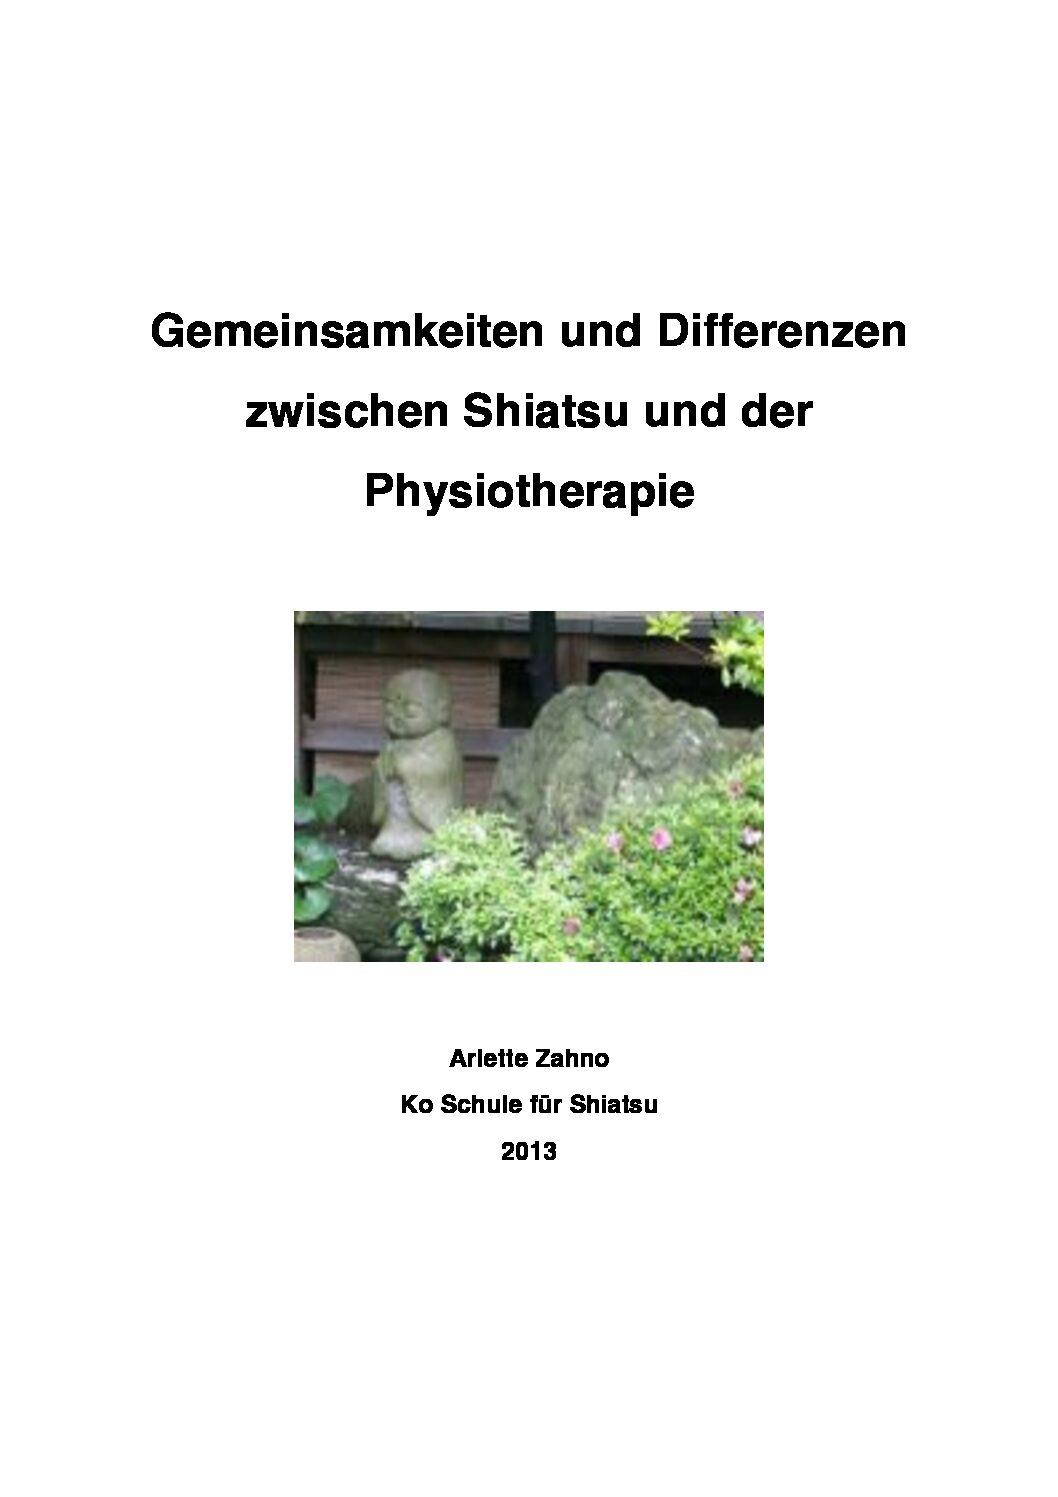 Shiatsu und Physiotherapie (2013, Arlette Zahno)